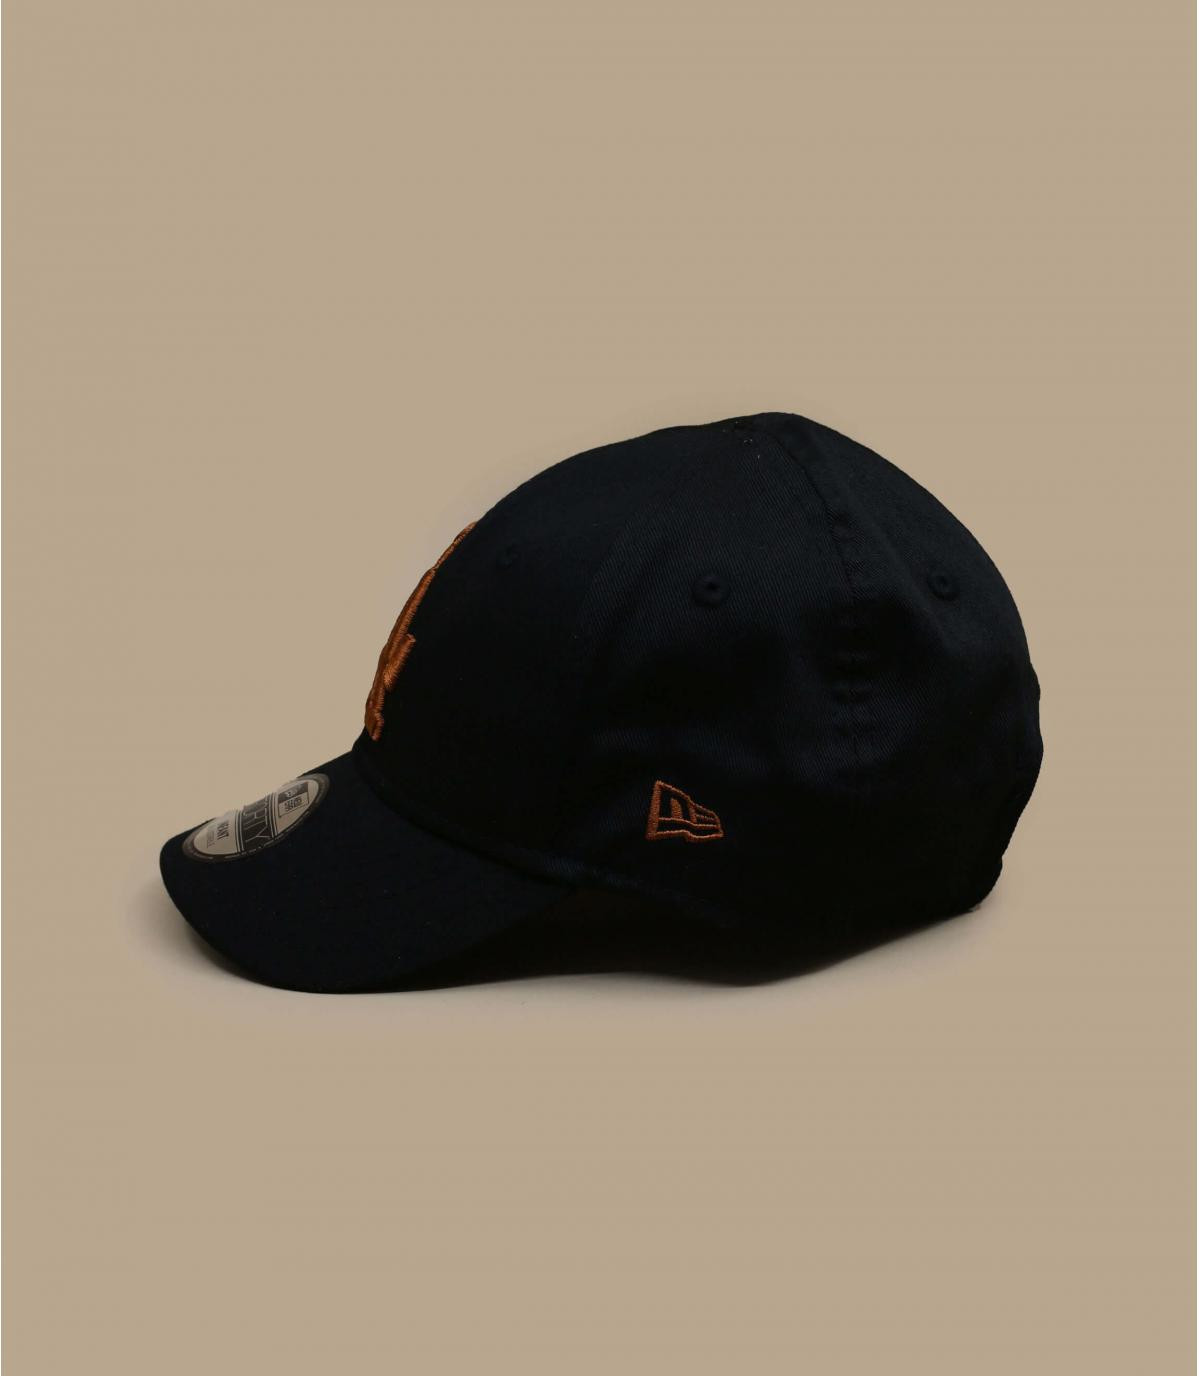 Details Baby Cap League Ess 940 LA black toffee - Abbildung 2